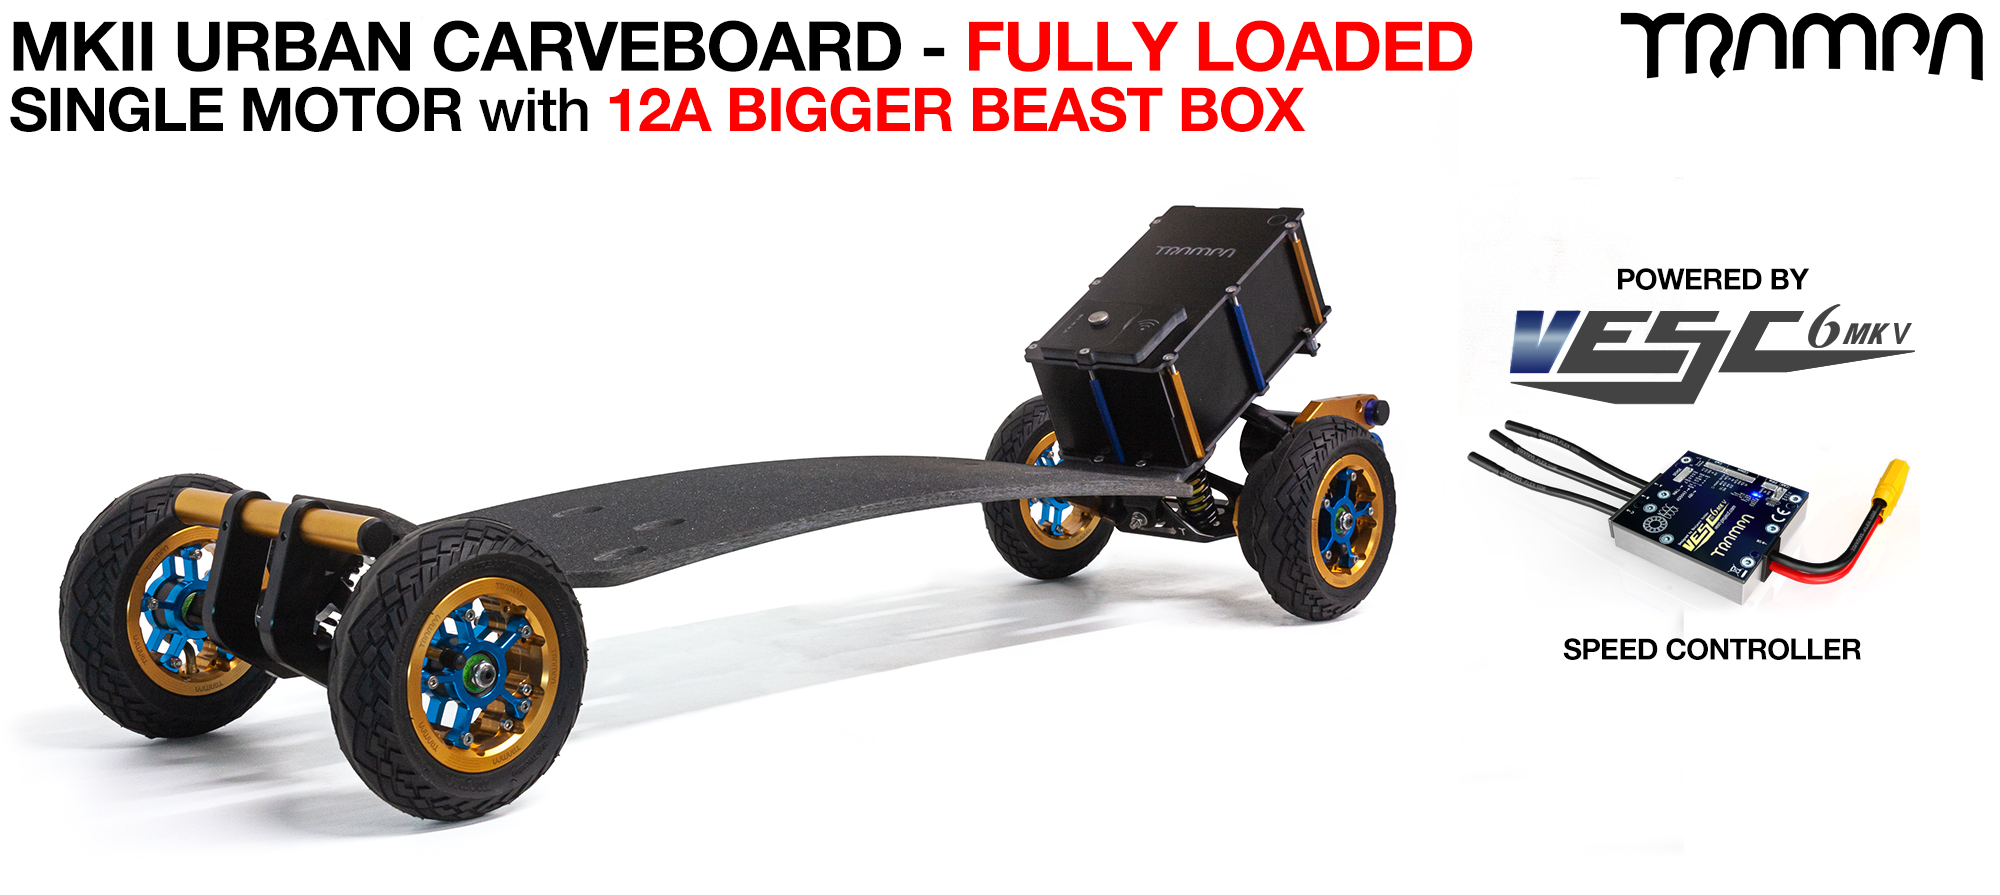 TRAMPA's MkIII Electric URBAN Carveboard - uses Mini Spring Trucks with MkIII Carve board Motor Mount,s Custom TRAMPA hubs & 125mm URBAN longboard Tyres - SINGLE Motor 12A FULLY LOADED